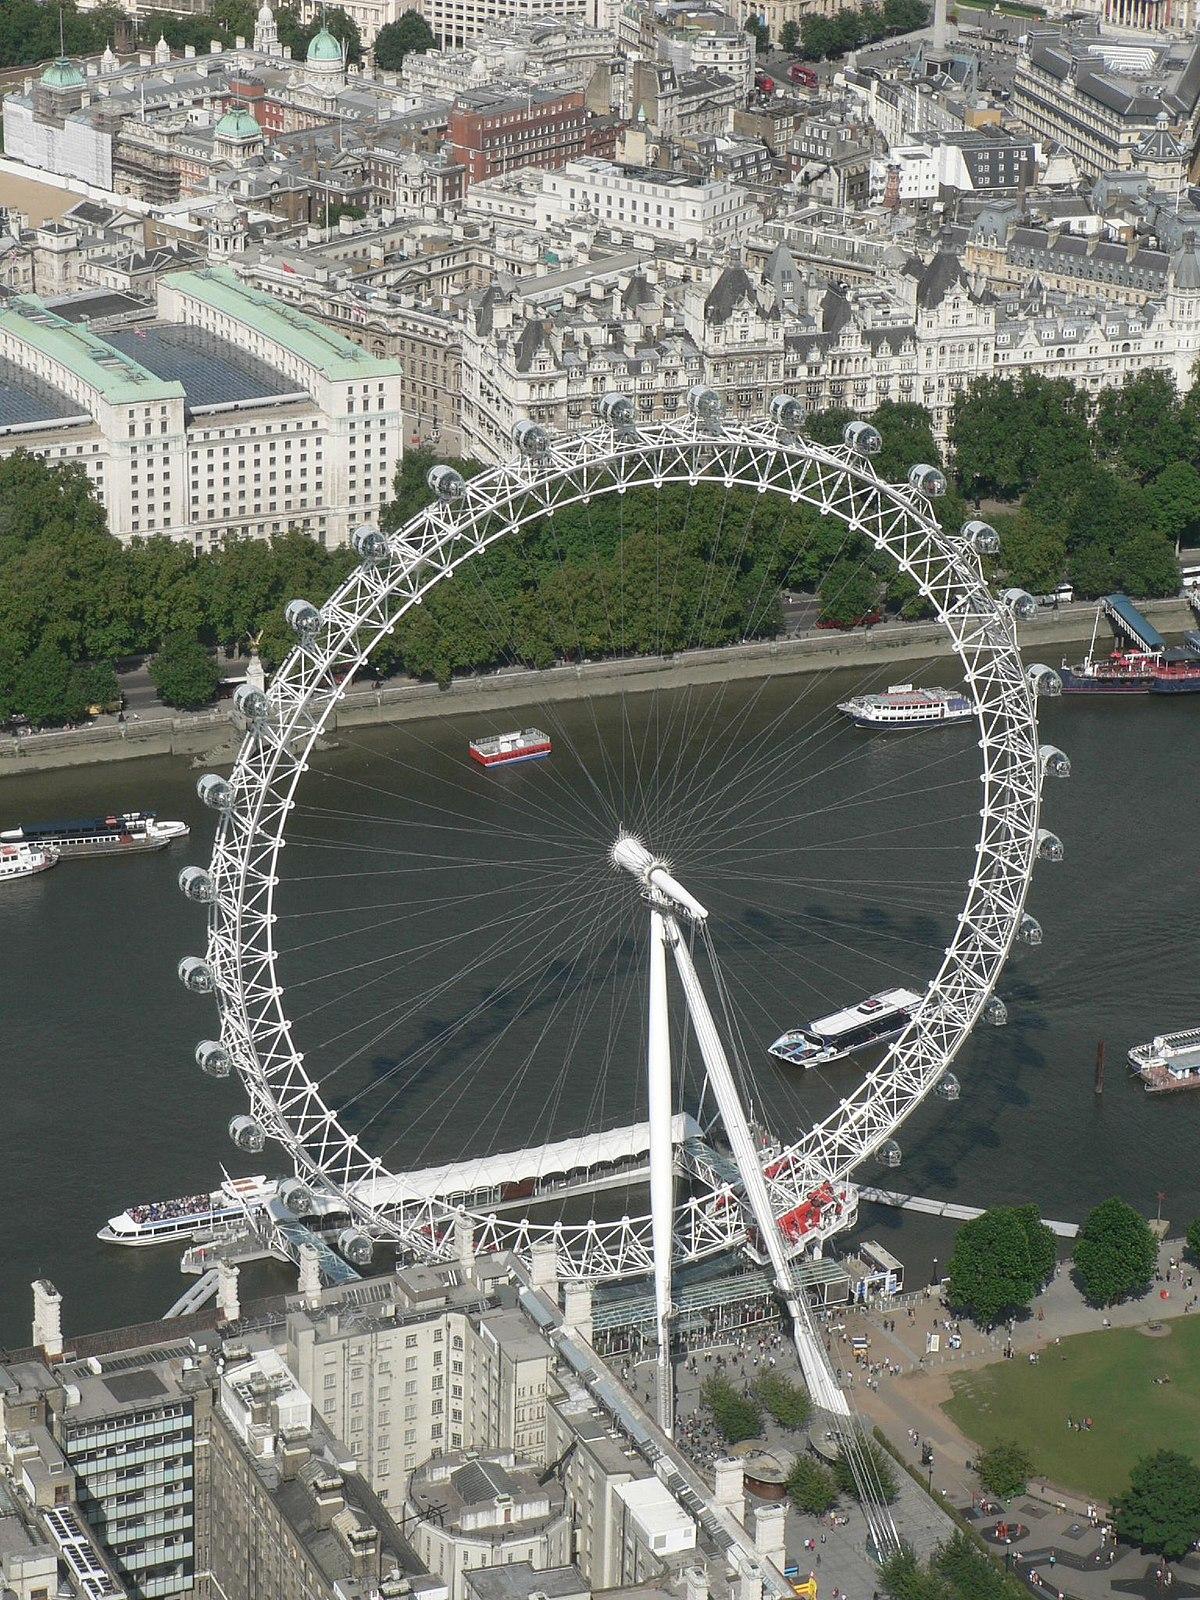 London Eye Simple English Wikipedia The Free Encyclopedia